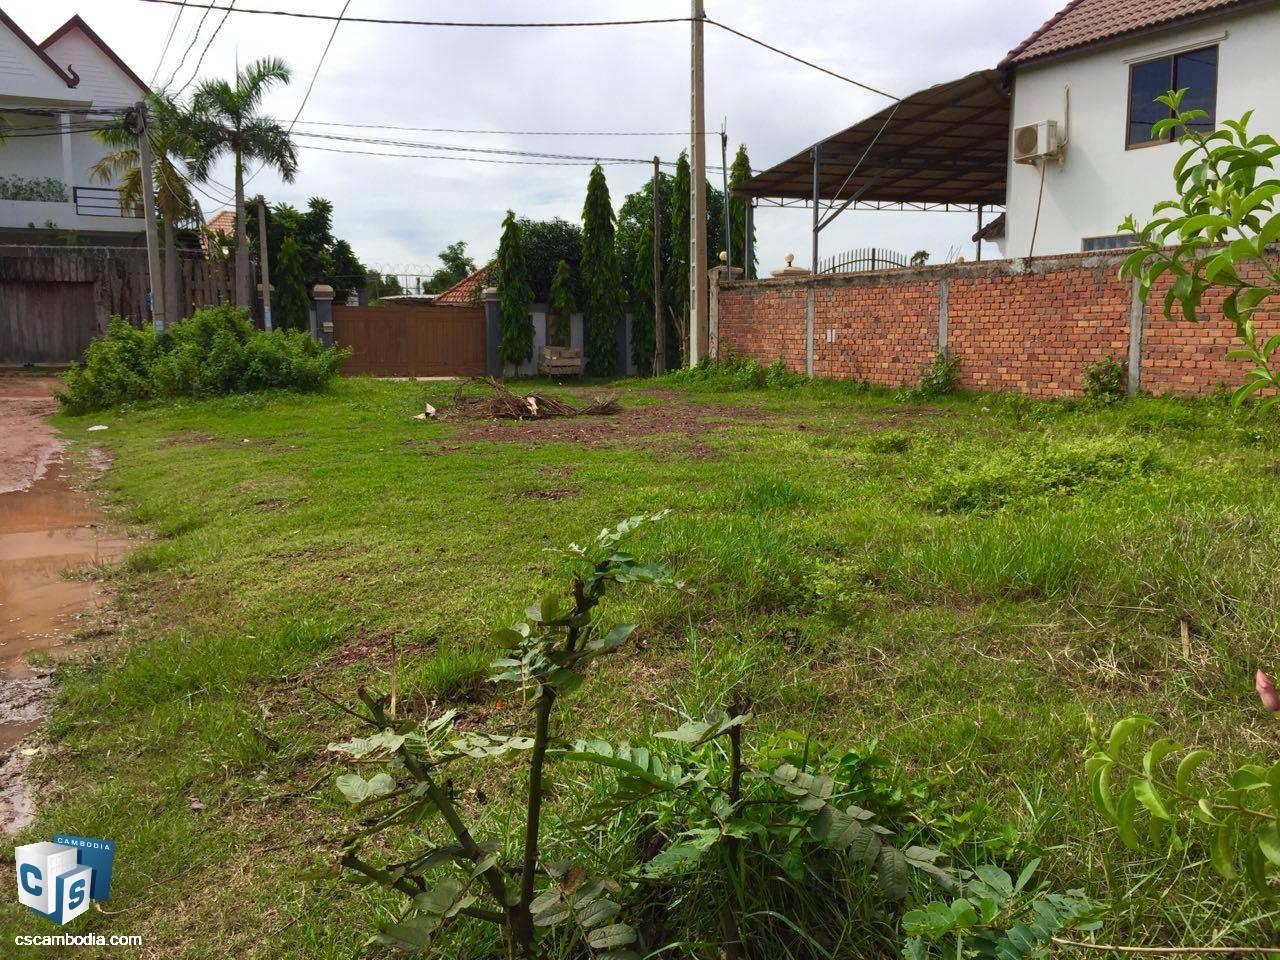 253 Sq meteres Land – For Sale – Taphul Village – Svay Dangkum Commune– Siem Reap